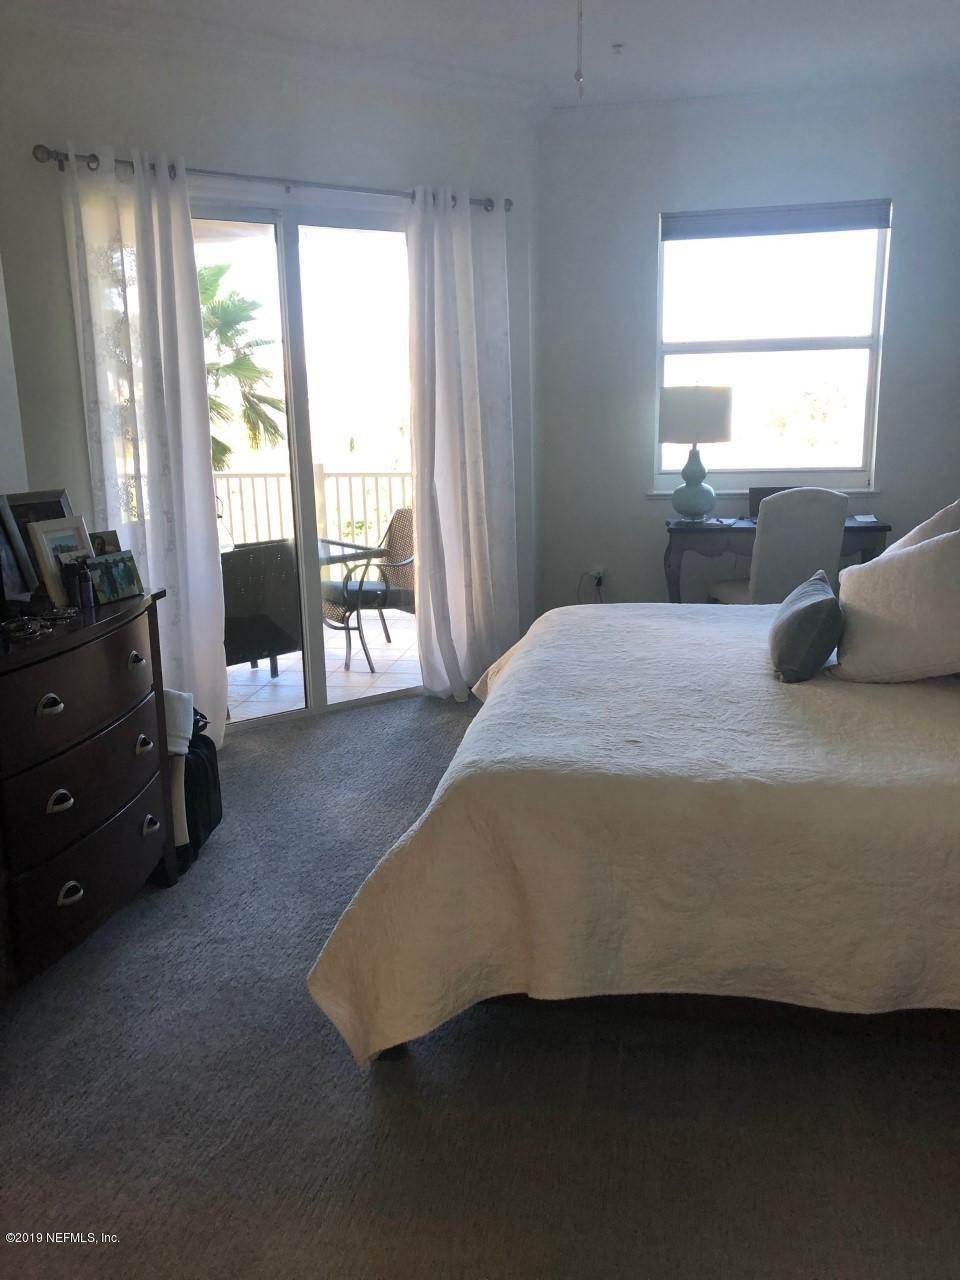 300 CINNAMON BEACH- PALM COAST- FLORIDA 32137, 3 Bedrooms Bedrooms, ,2 BathroomsBathrooms,Condo,For sale,CINNAMON BEACH,1019769